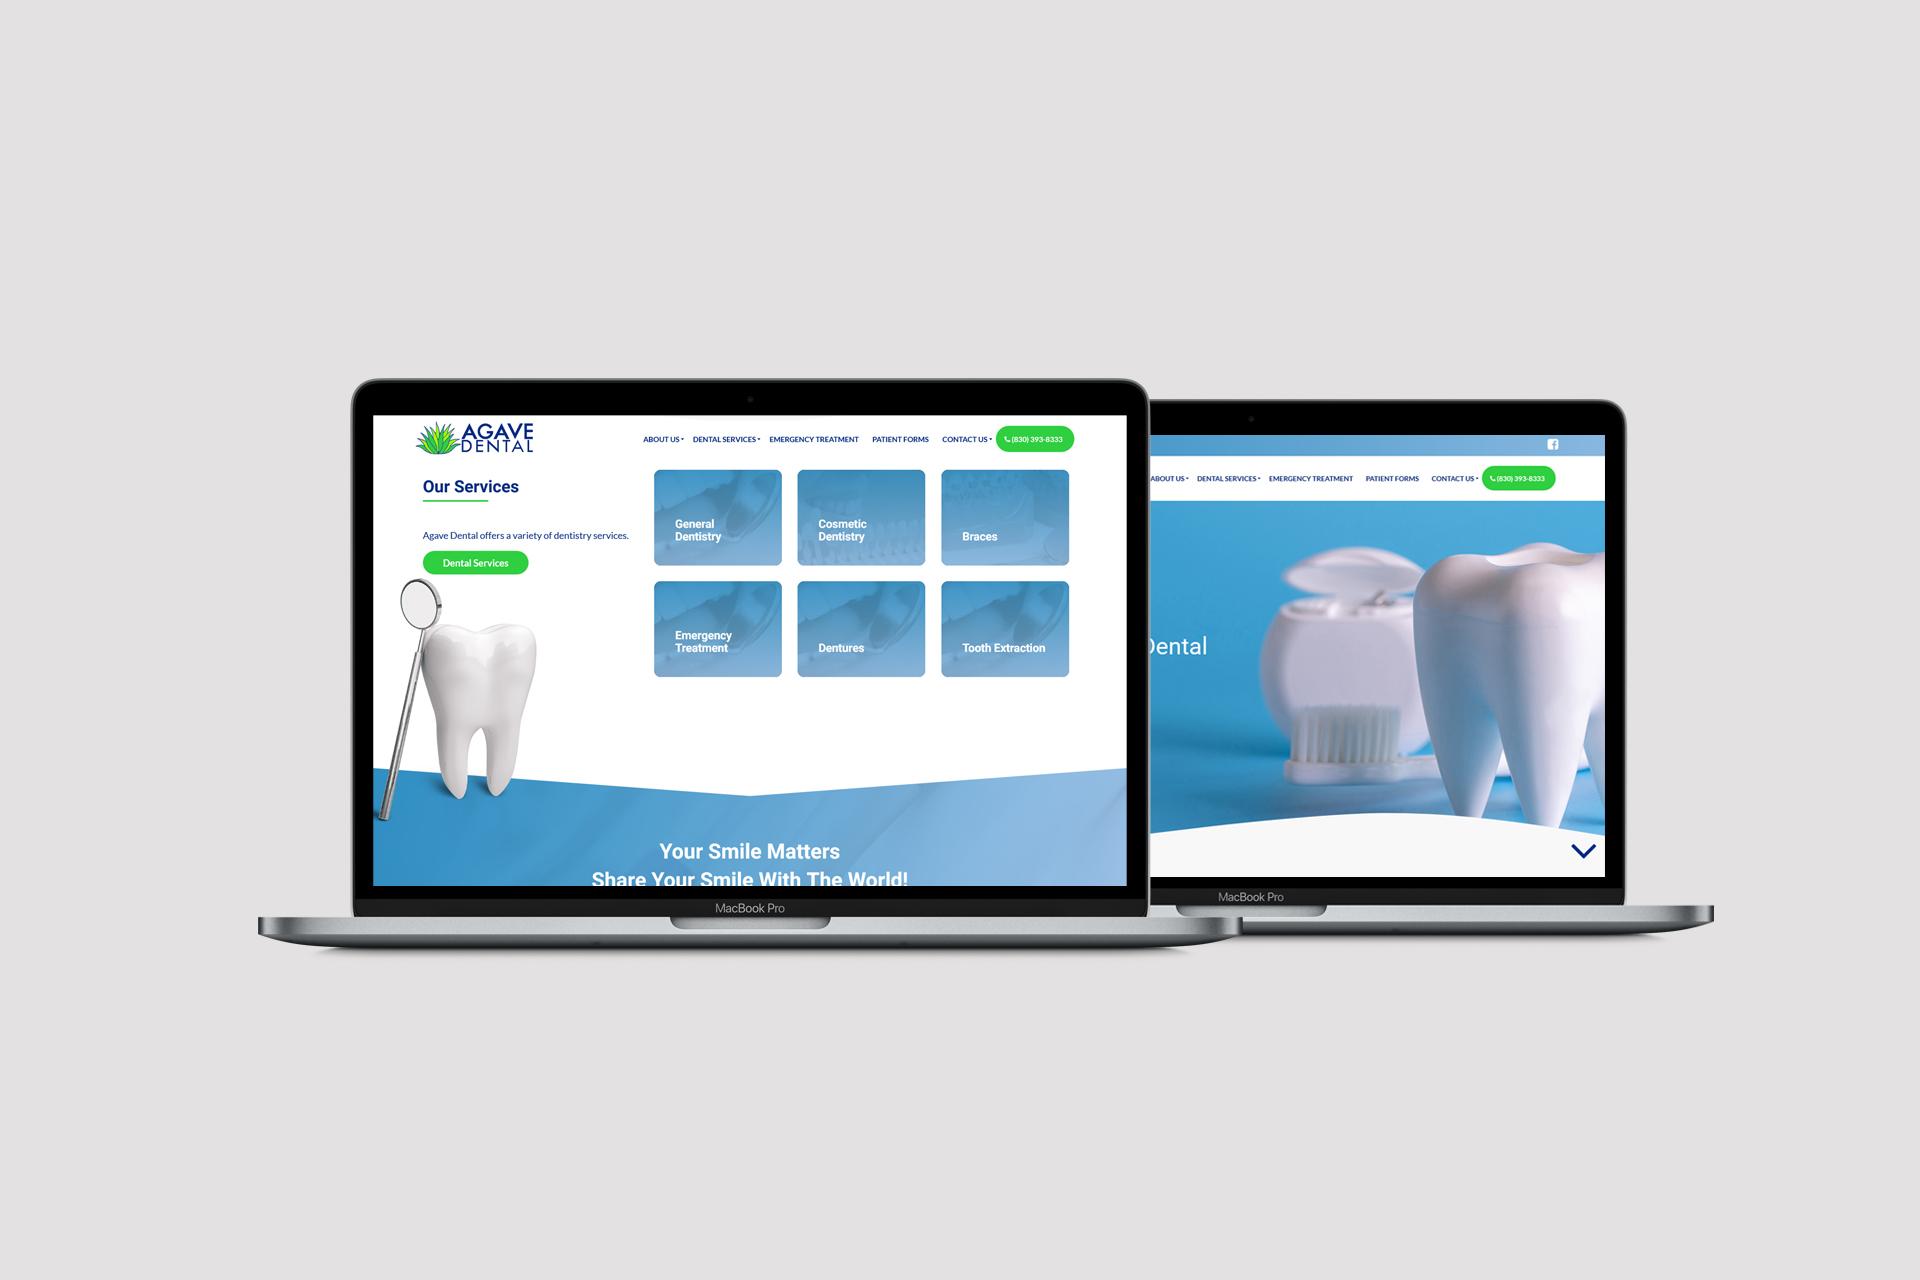 Agave Dental desktop website screenshots on MacBooks